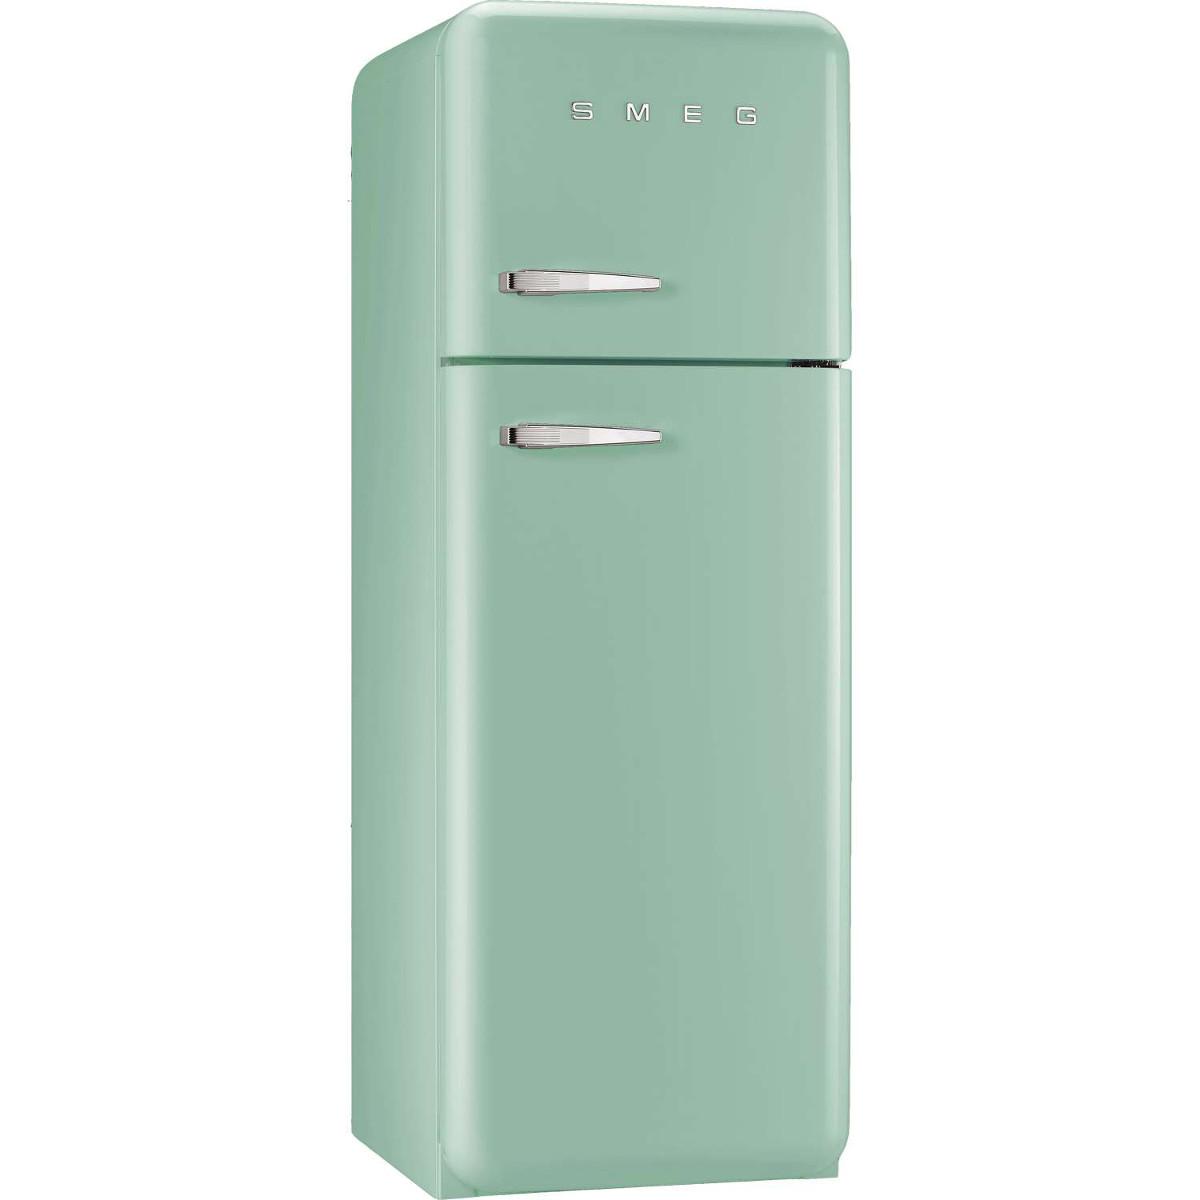 Smeg FAB30RFG 50's Style Retro Fridge Freezer – Pastel Green